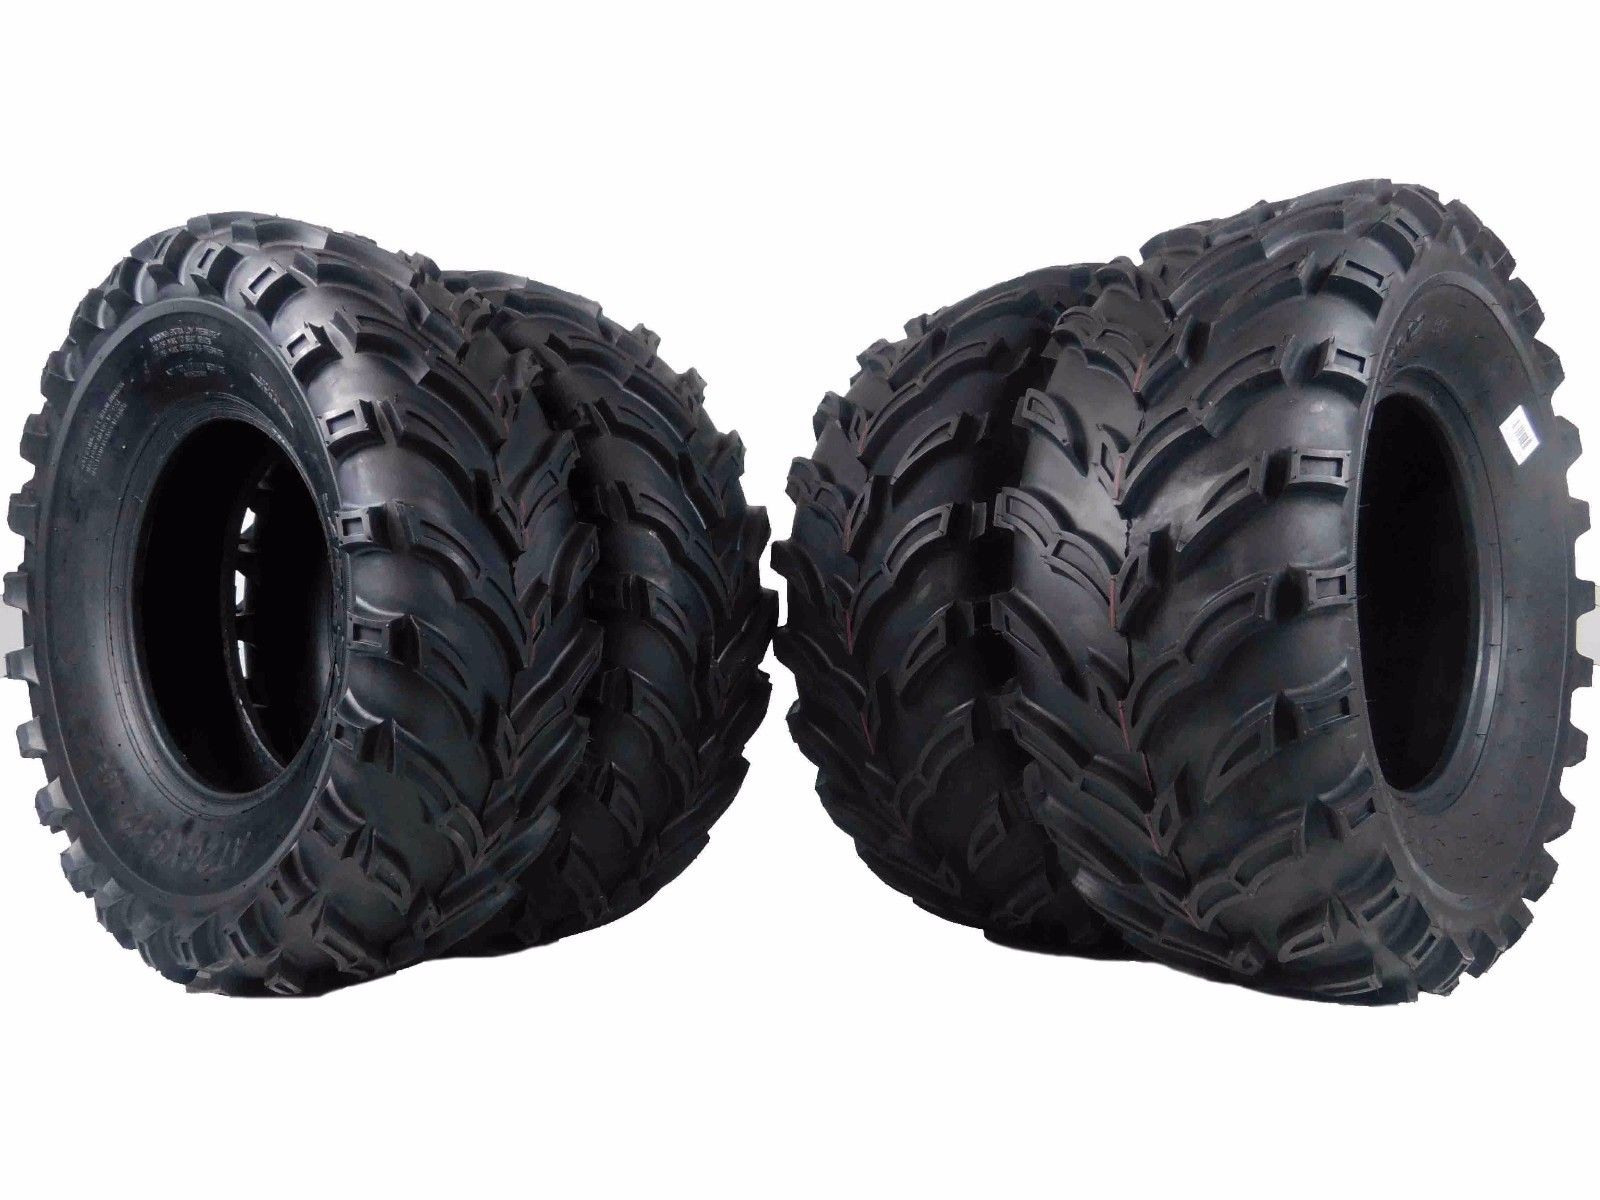 New MASSFX MS Claw ATV Tires 2 26x9-12 Front 2 26x11-12 Rear 4Set 6Ply Bear K299